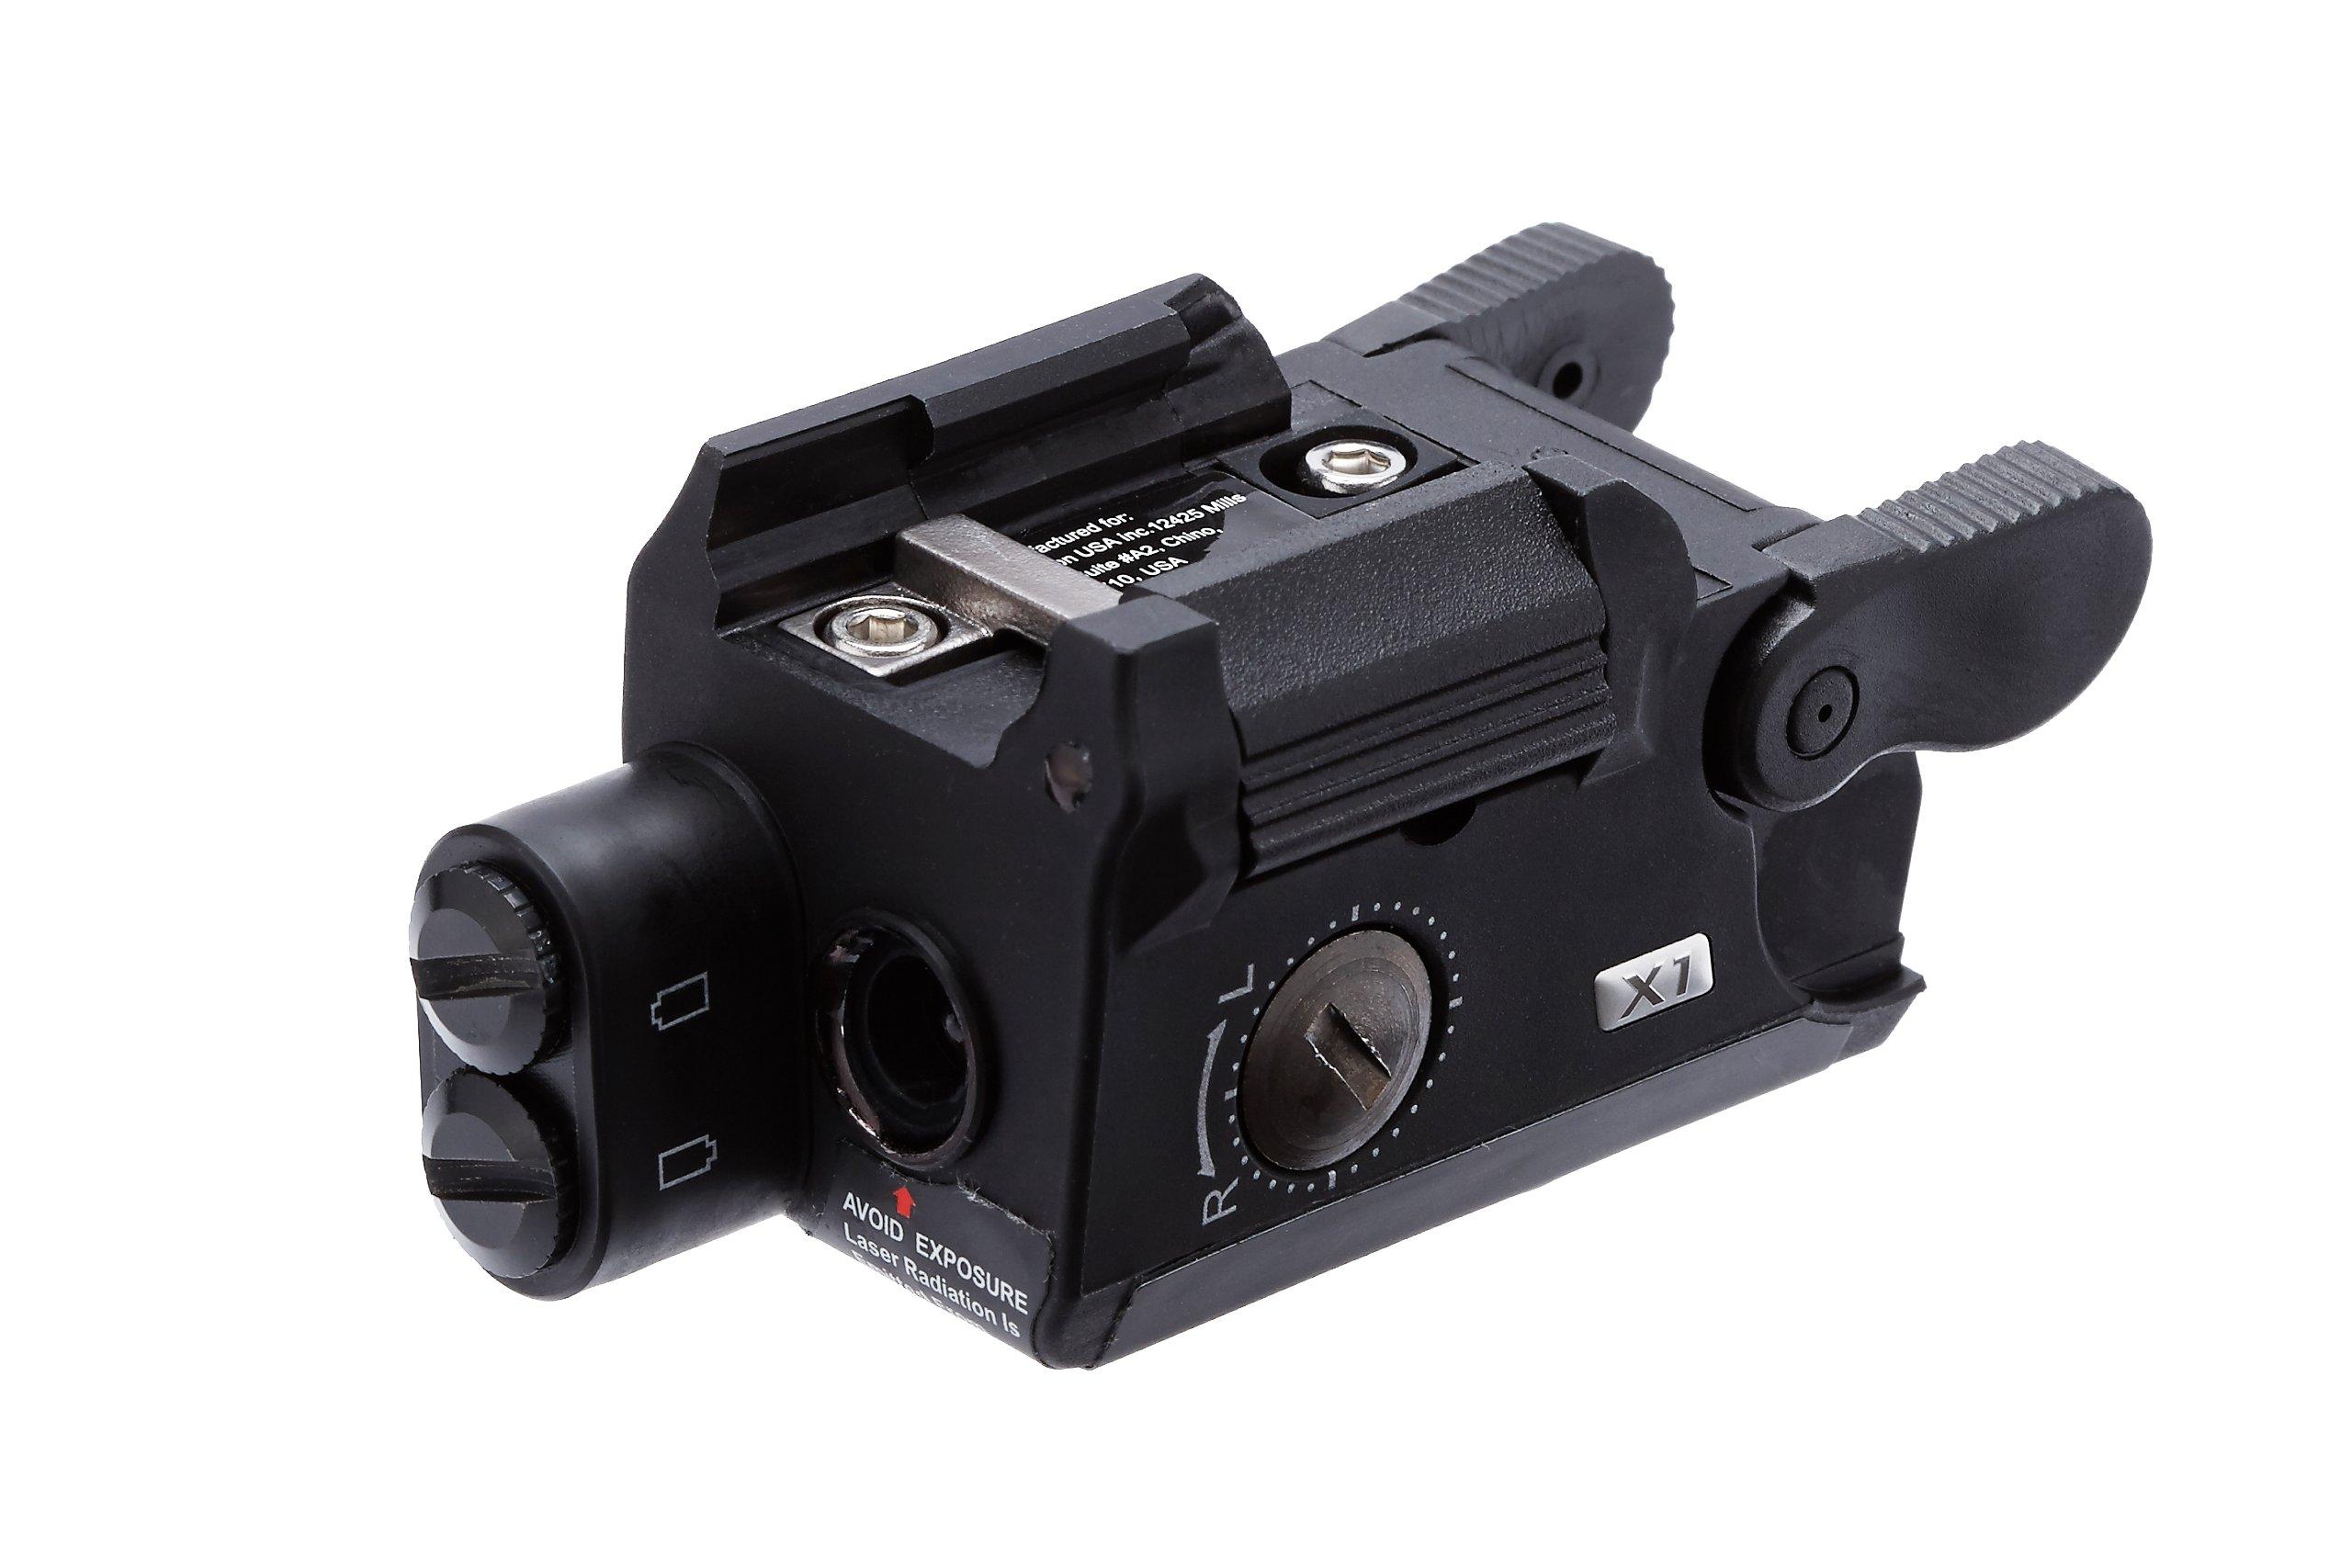 Beamshot X1-G Green Laser Sight, Black by Beamshot